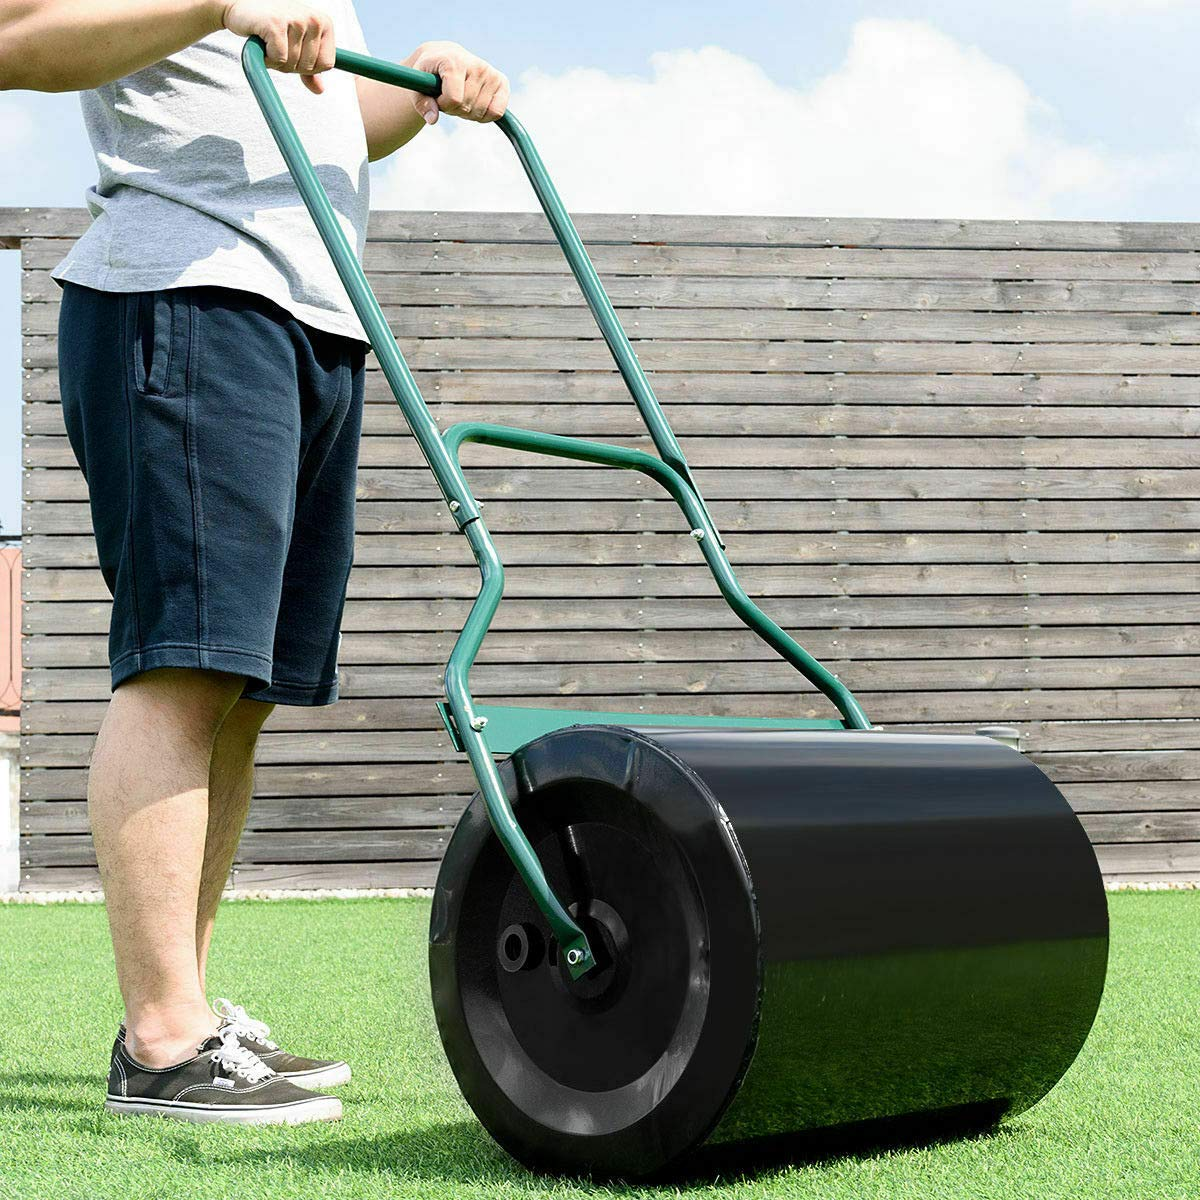 MAREEYA SHOP 16''x 19.5'' Heavy Duty Poly Push Tow Lawn Roller Poly Roller Mower Steel